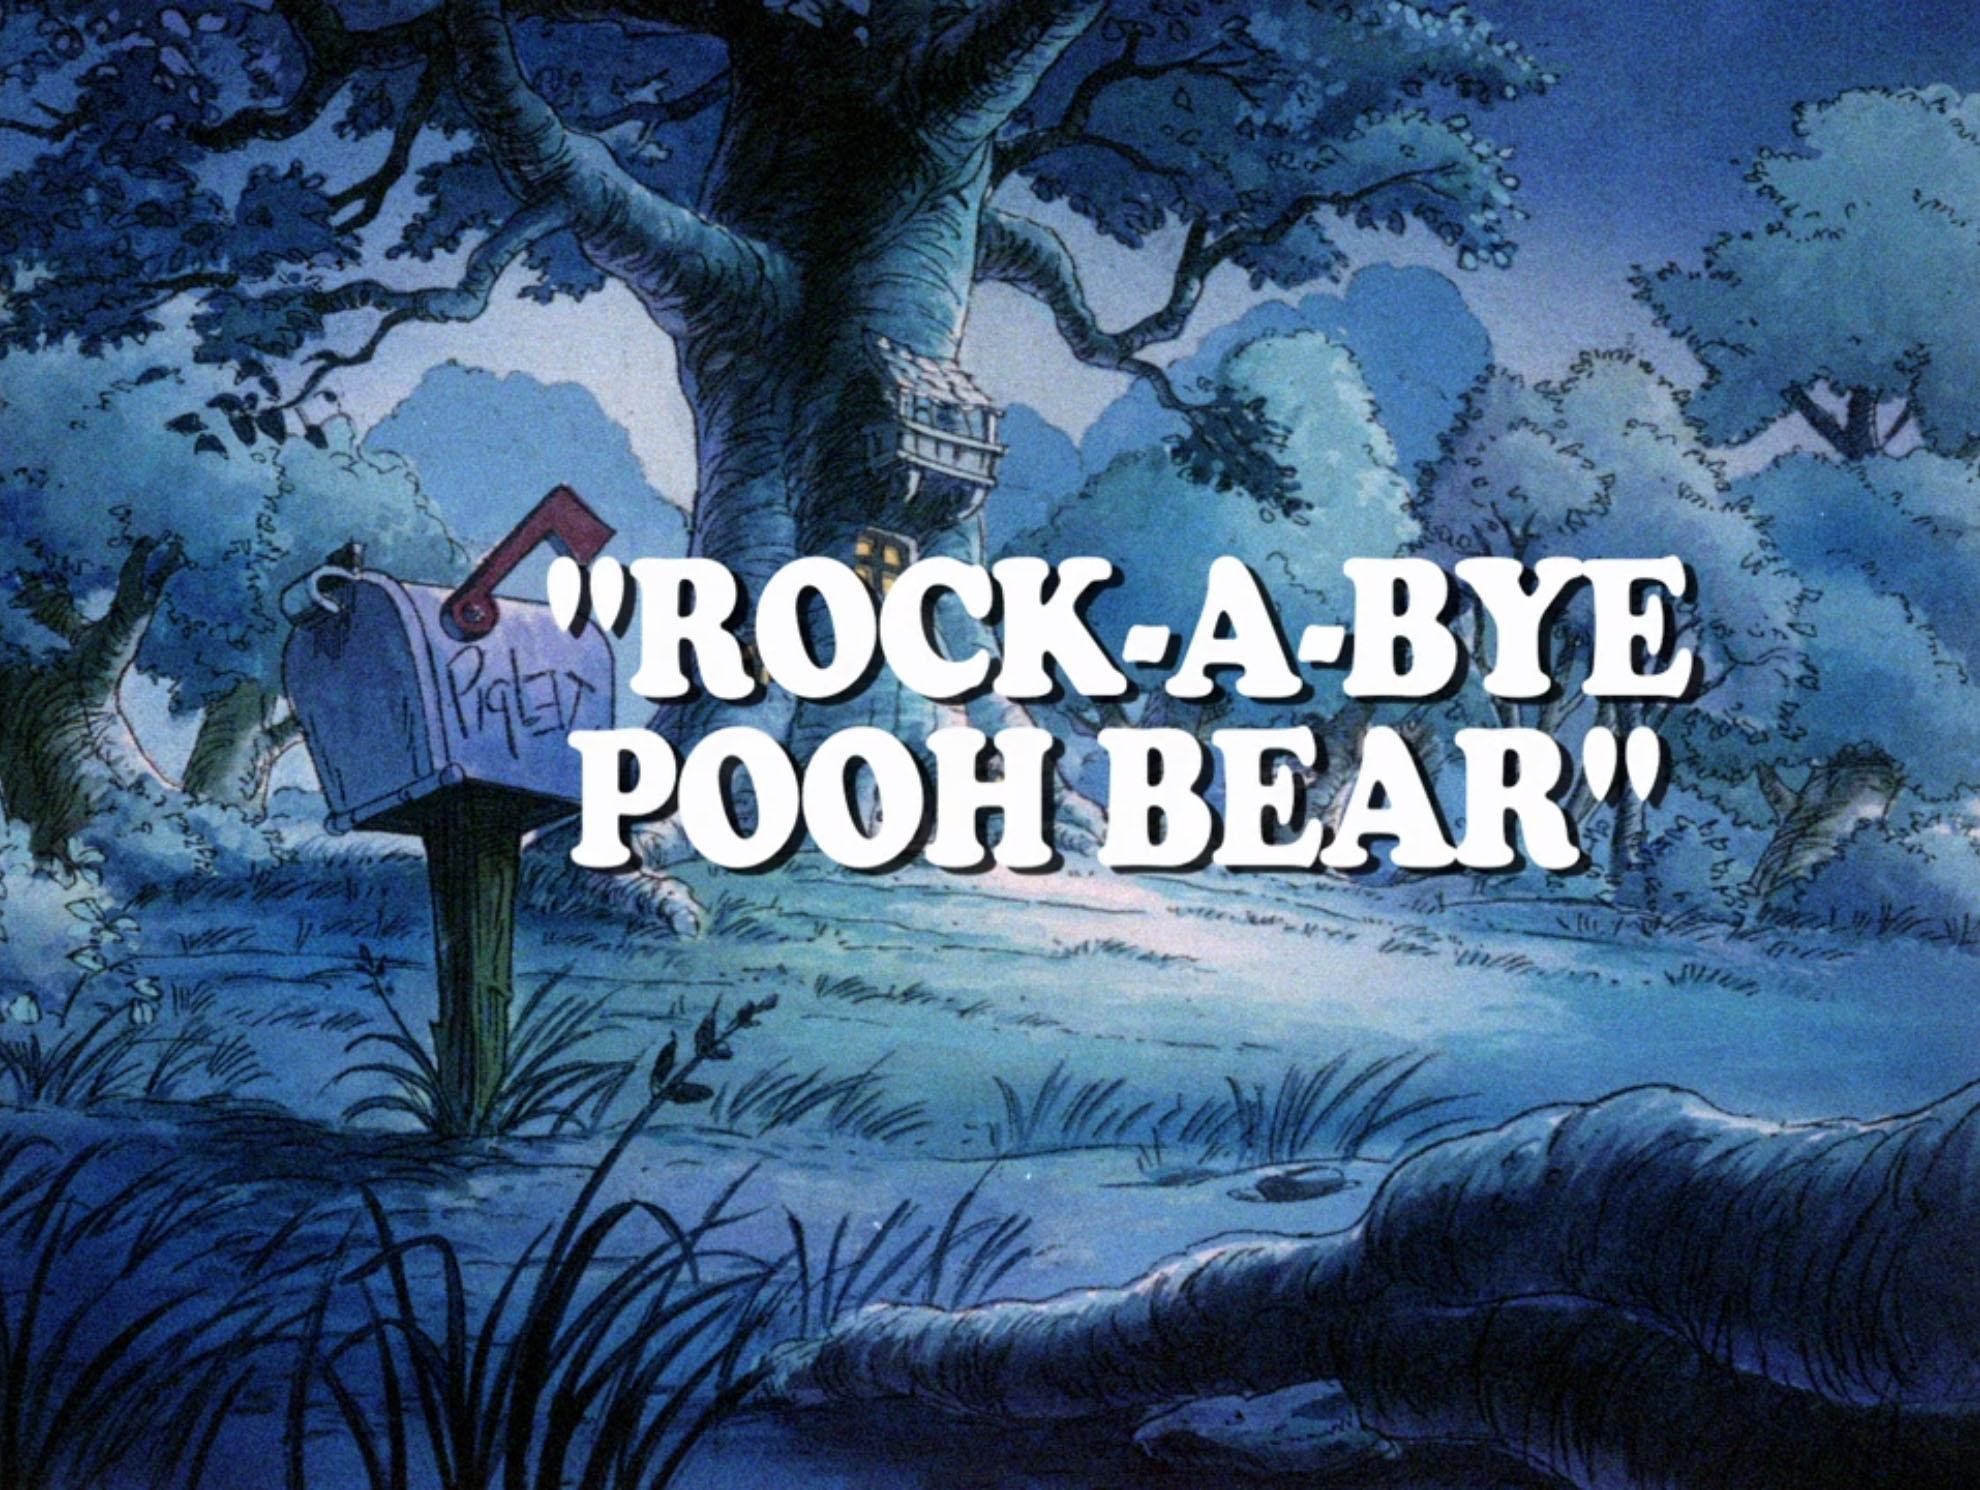 File:Rockabyepoohbear.jpg